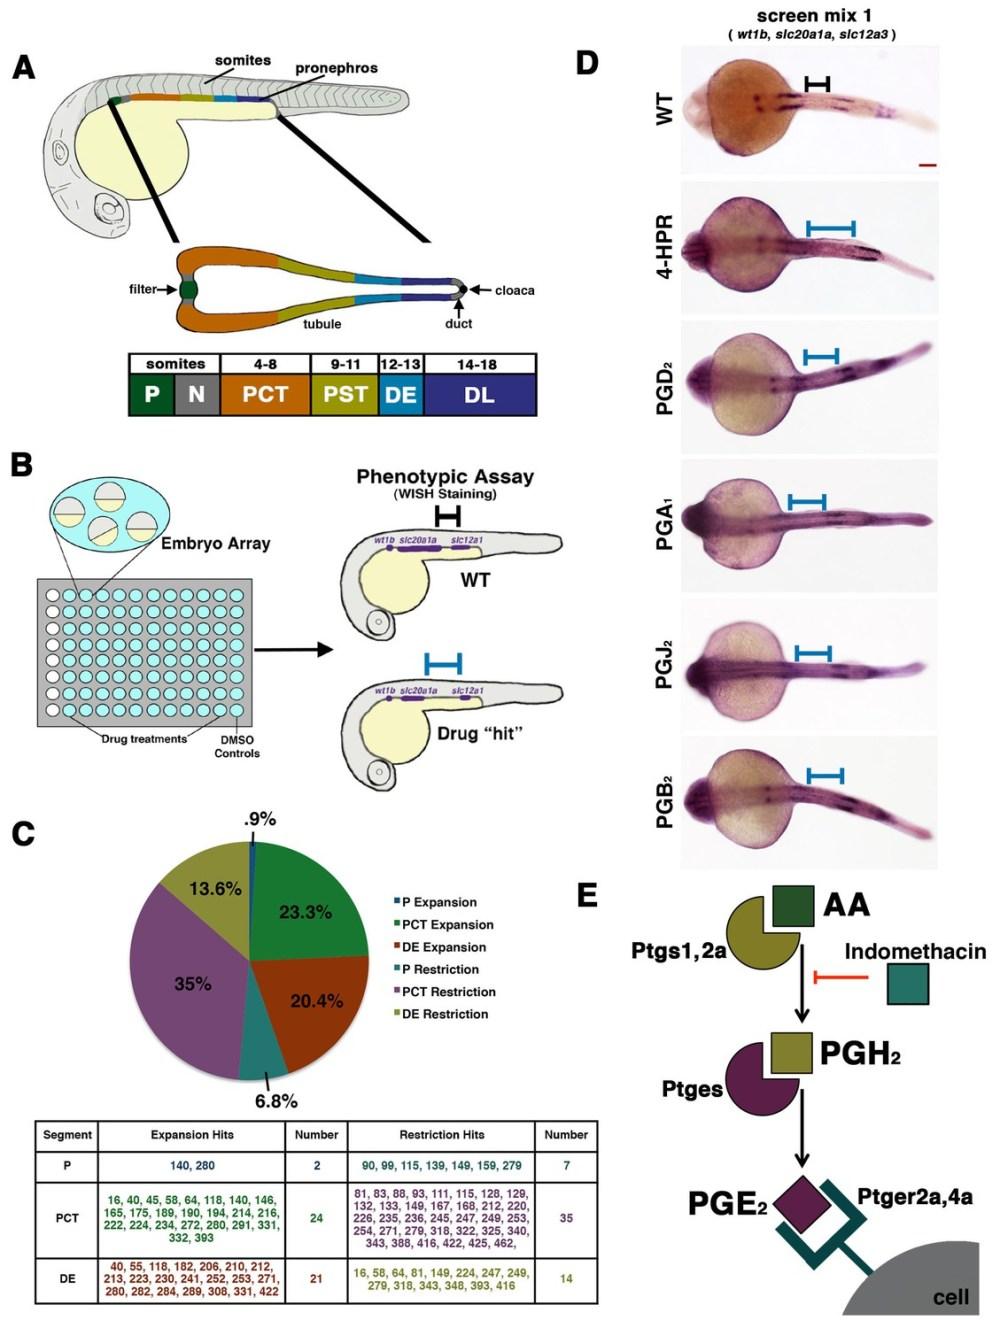 medium resolution of a novel small molecule screen reveals that prostaglandins alter nephron patterning